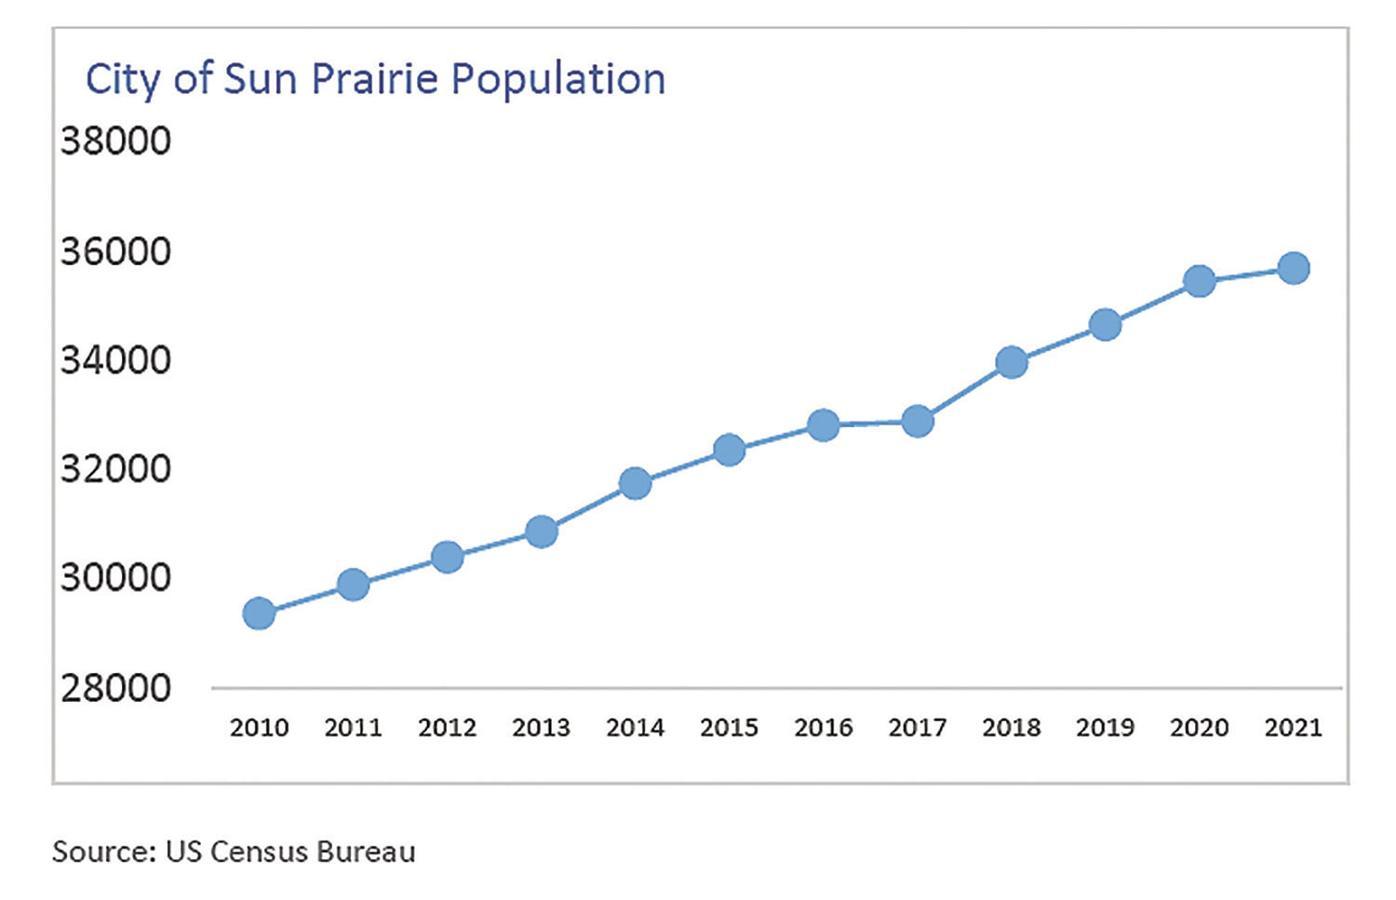 City of Sun Prairie population